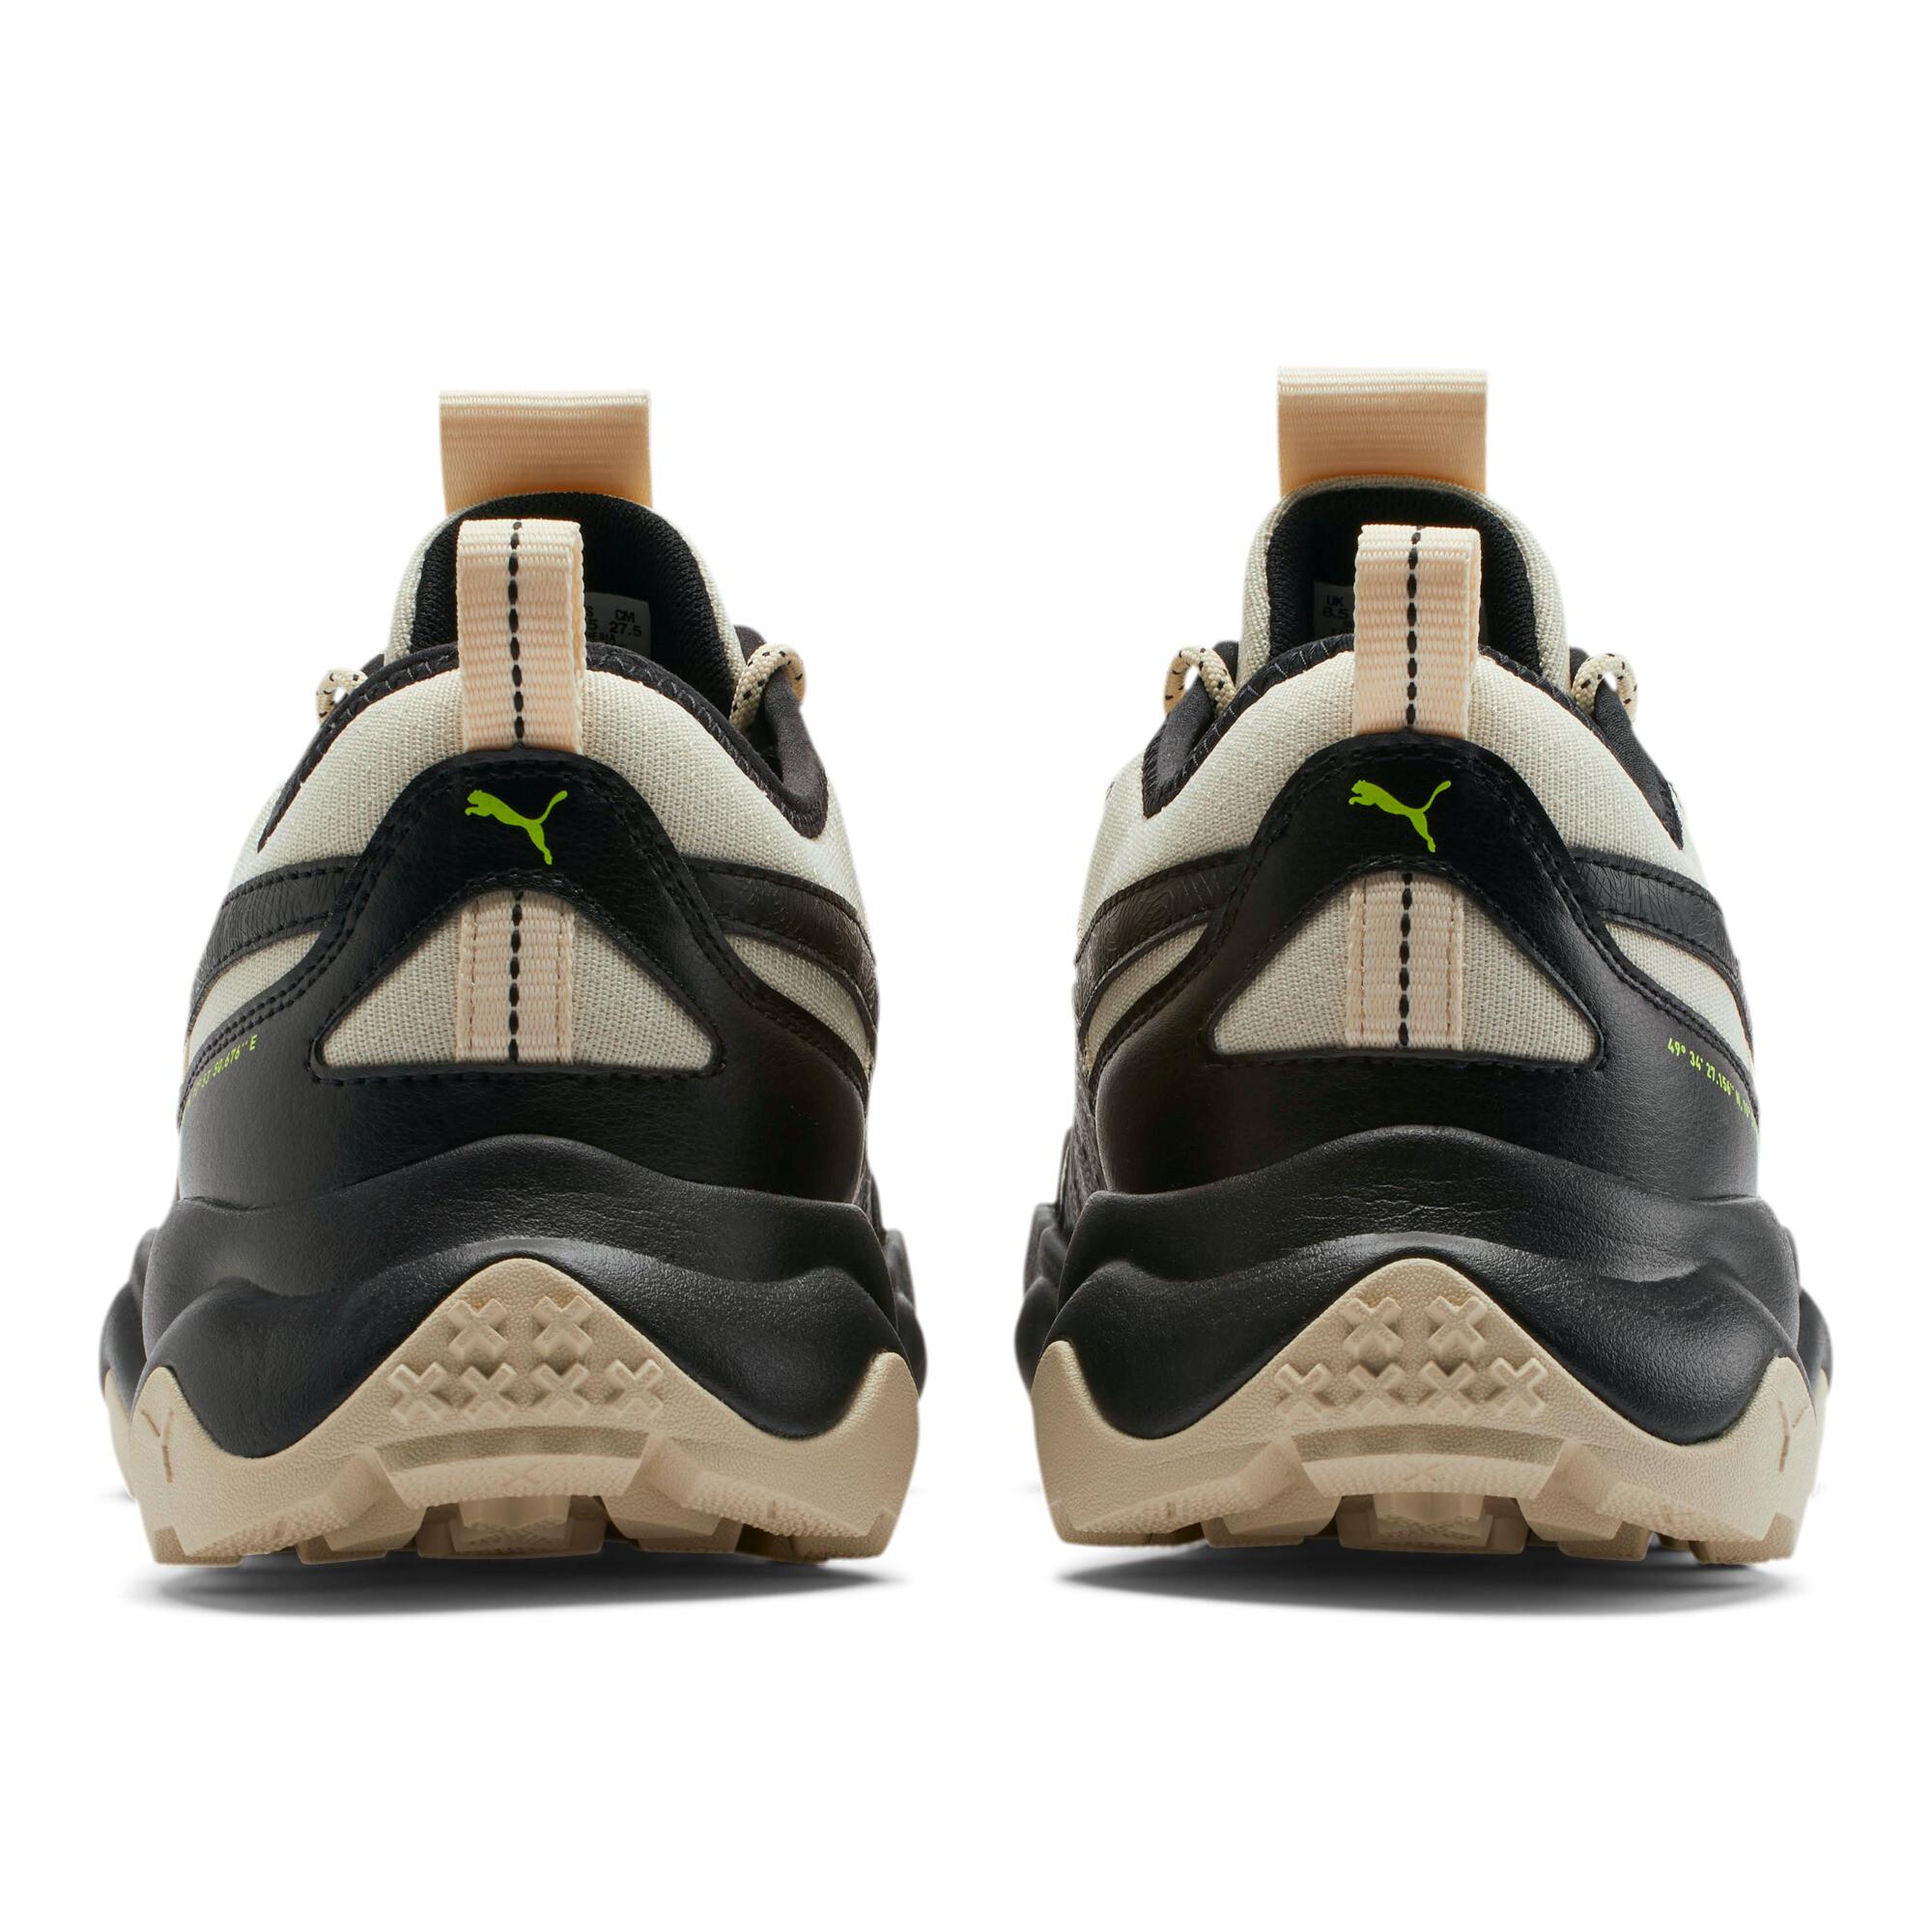 PUMA-Ember-Trail-Men-s-Running-Shoes-Men-Shoe-Running thumbnail 15